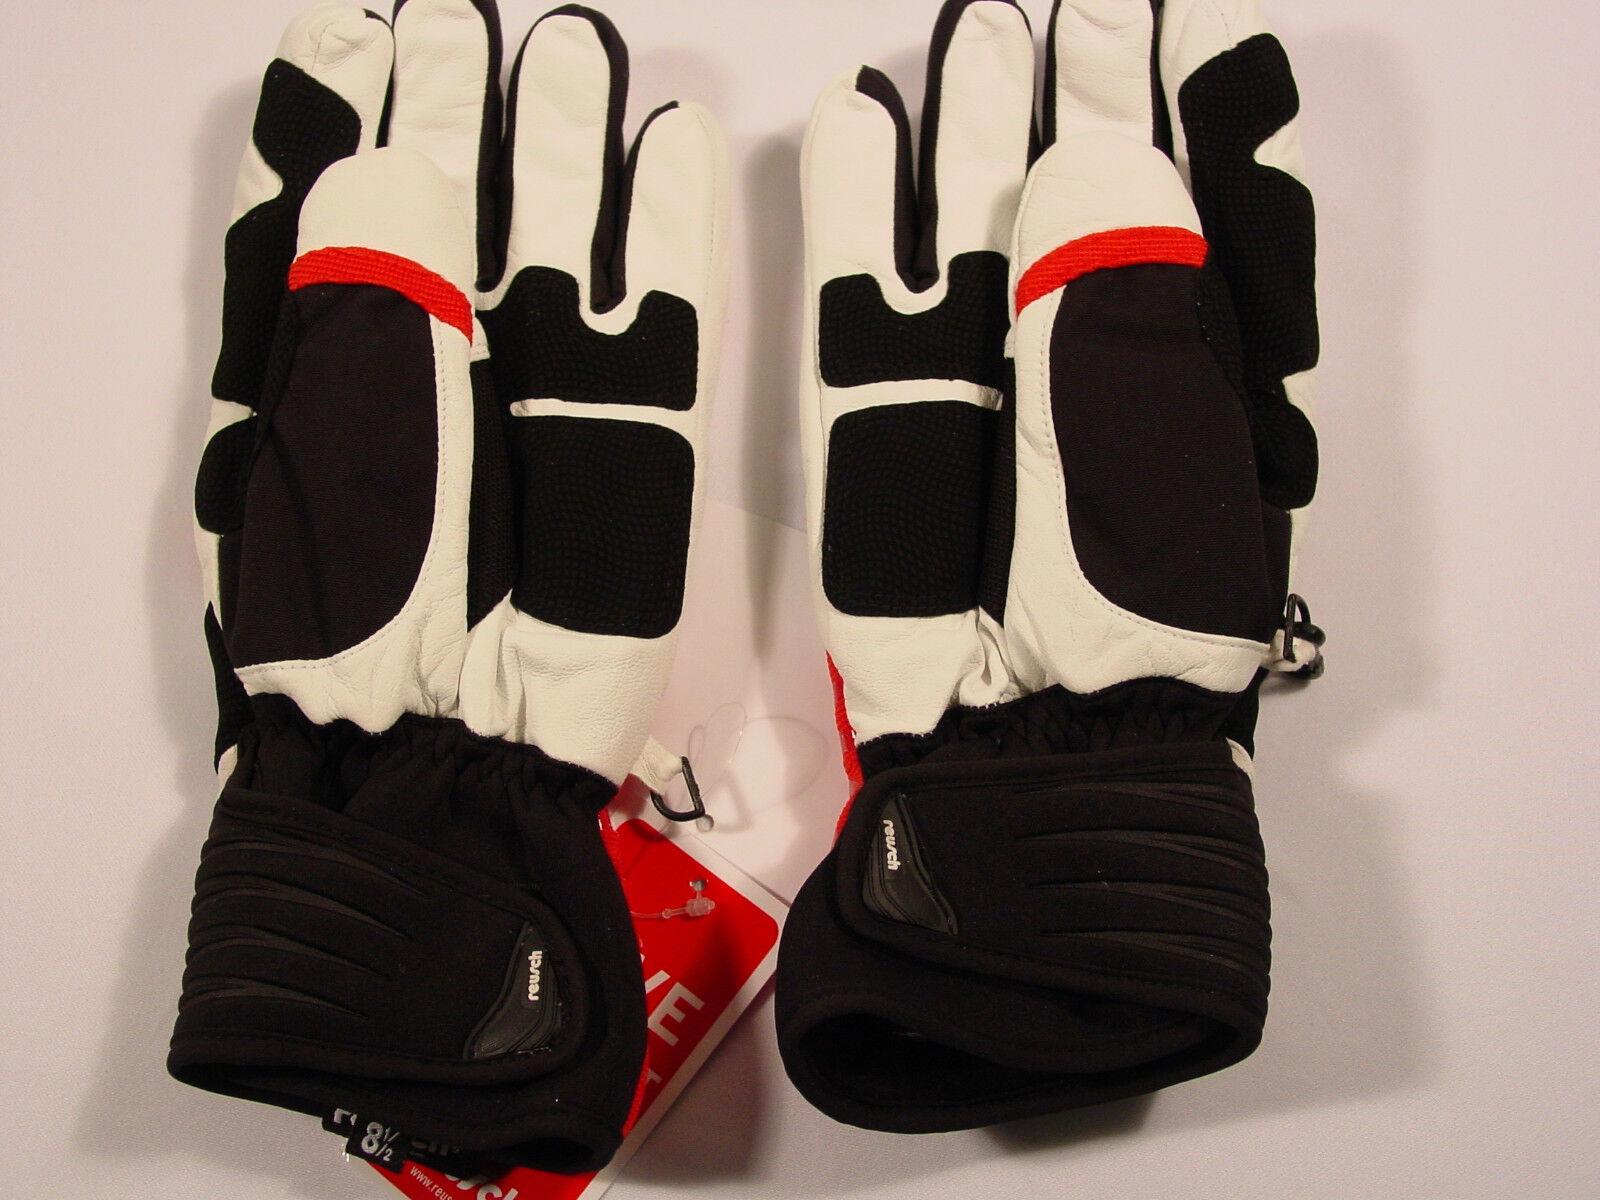 New Reusch RtexXT Goatskin Leder Ski Gloves Medium Medium Gloves (8.5) Crislallo  2887207 719d5d